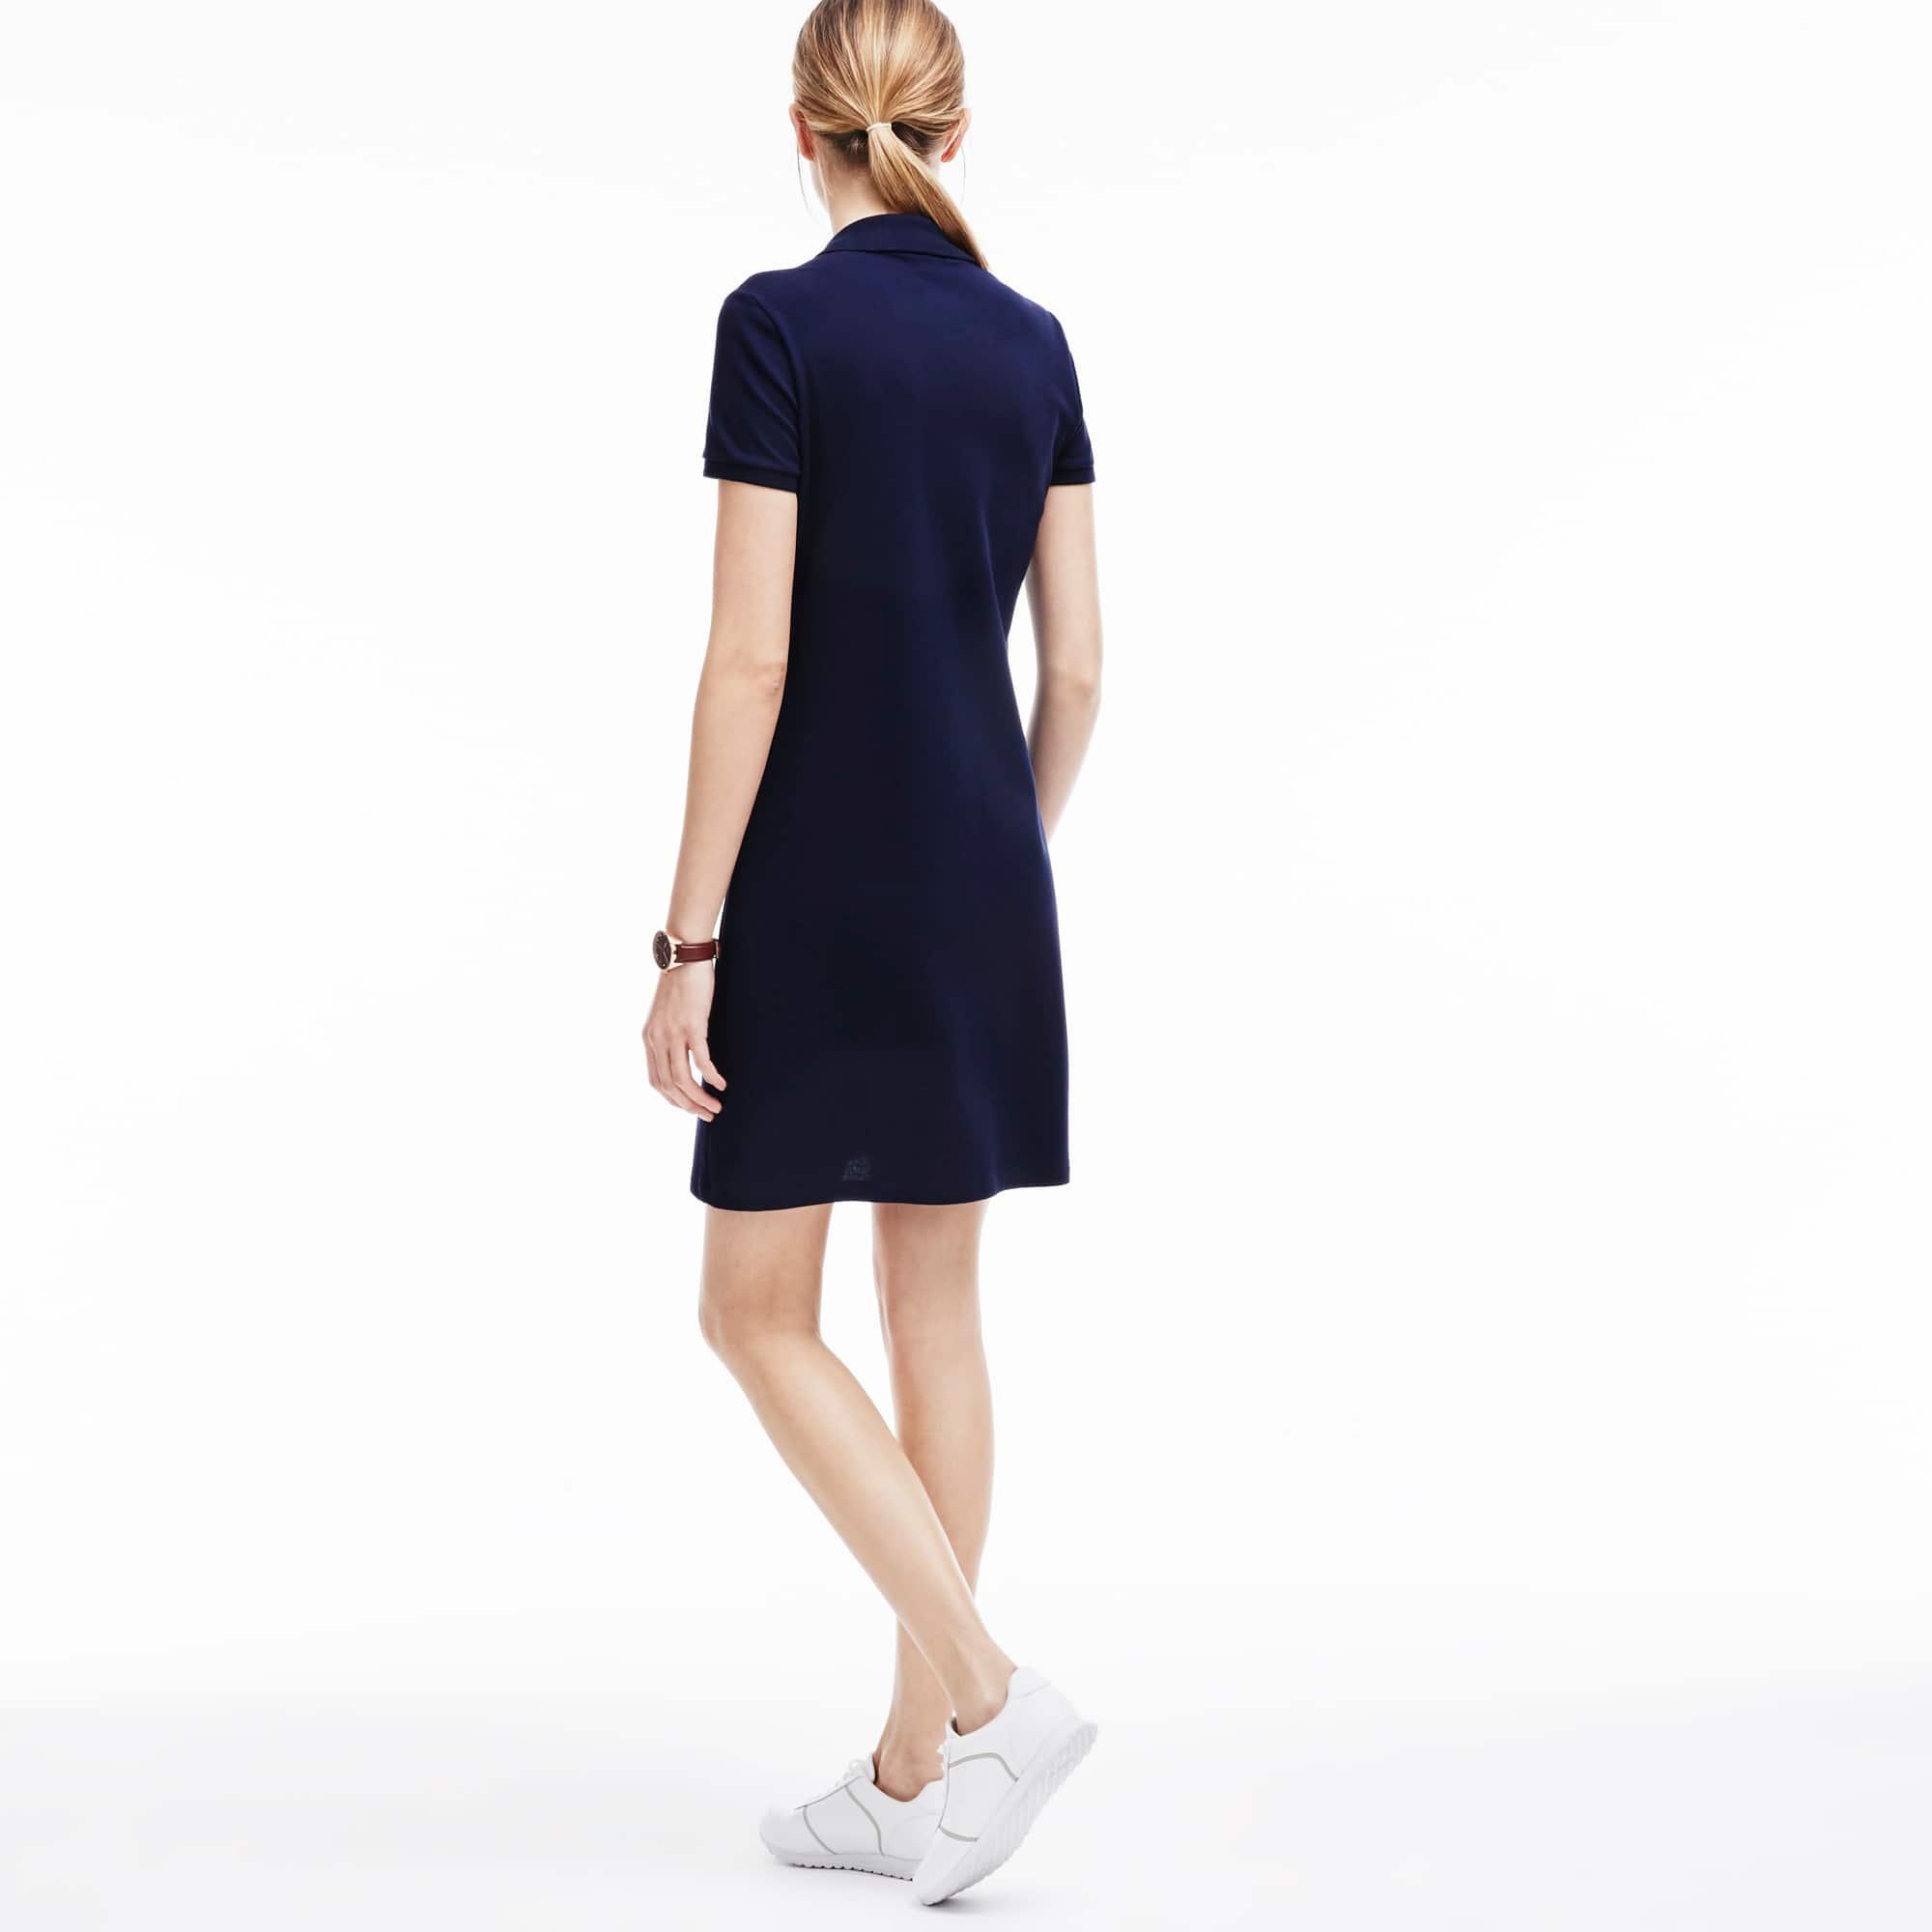 LACOSTE Cottons Women's Polo dress in stretch mini piqué